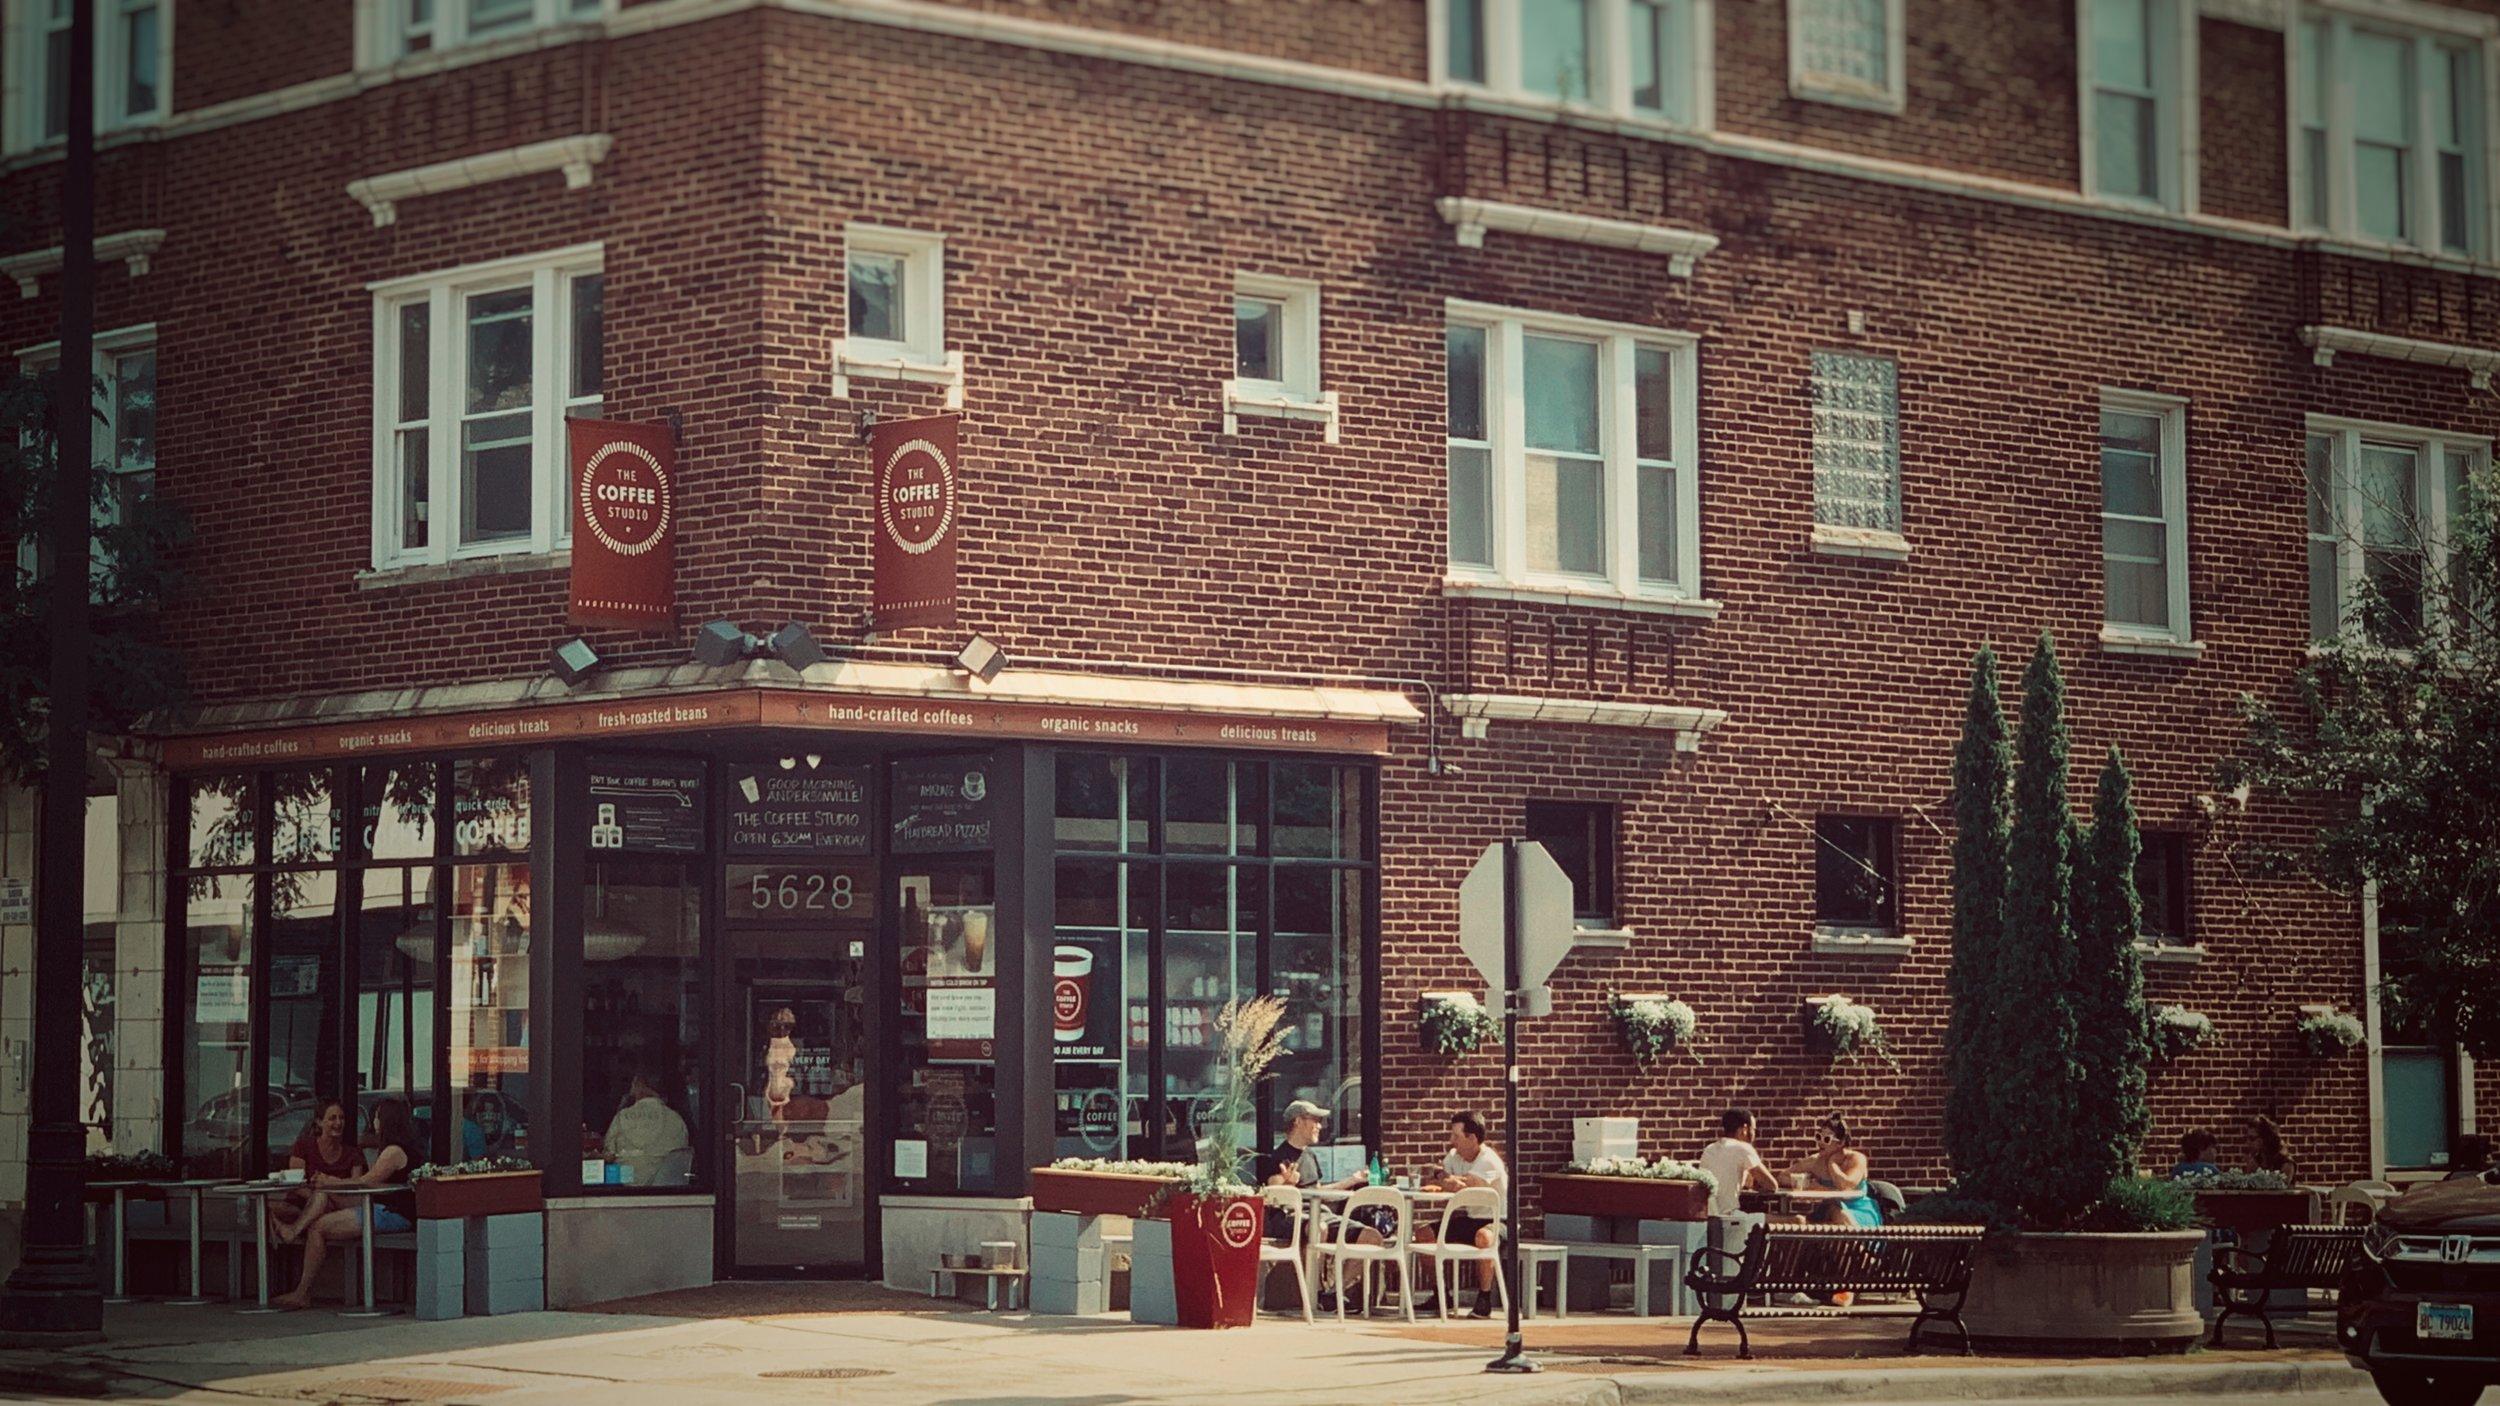 The Coffee Studio at 5628 N. Clark St